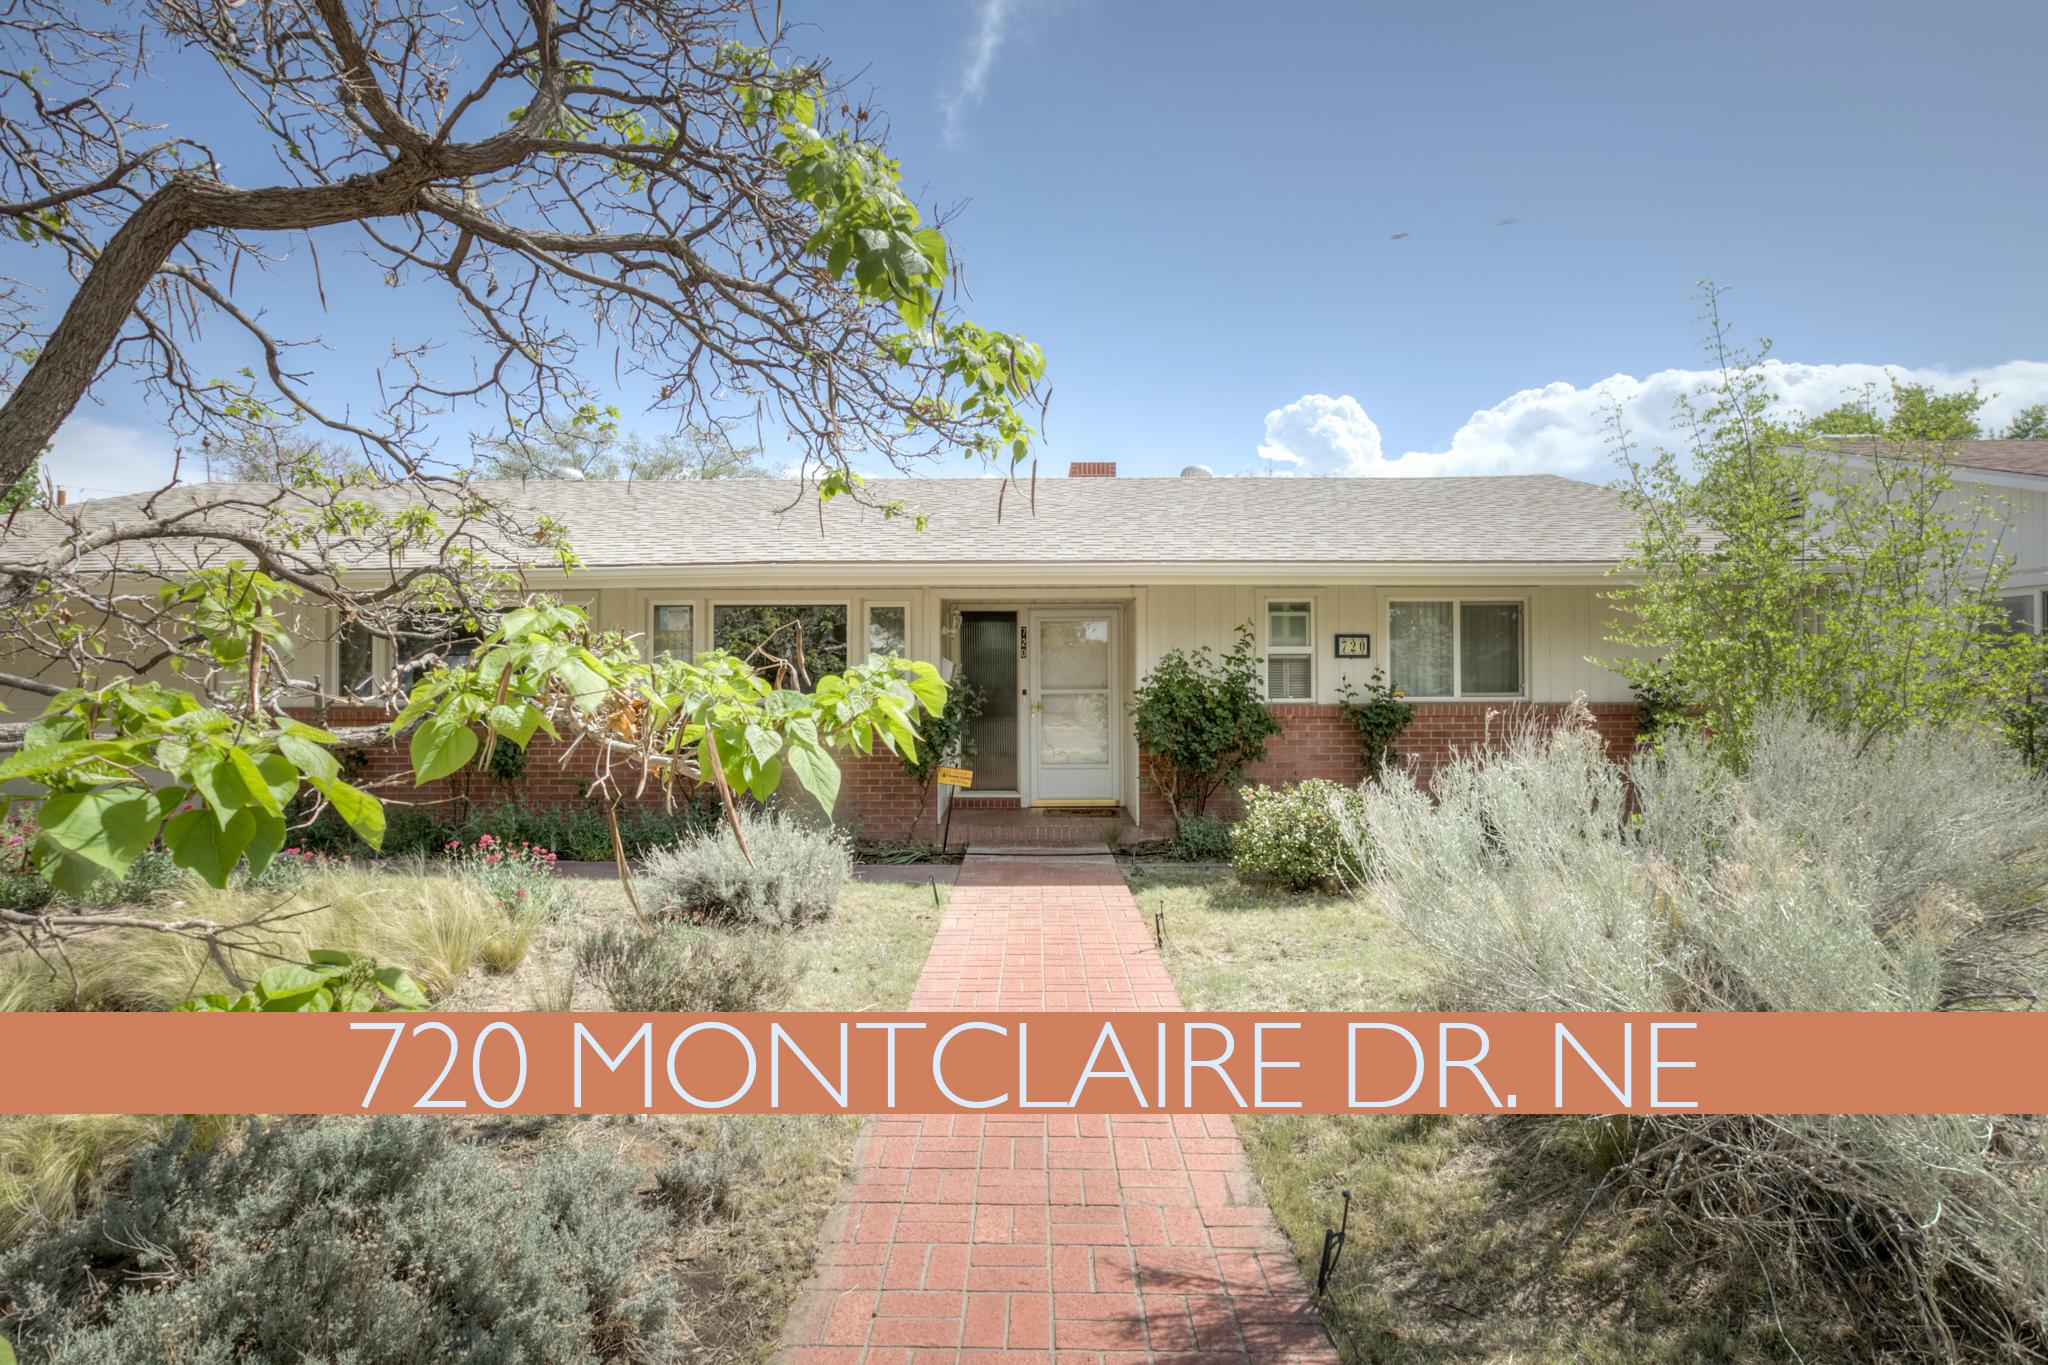 720 Montclaire Drive NE Property Photo - Albuquerque, NM real estate listing